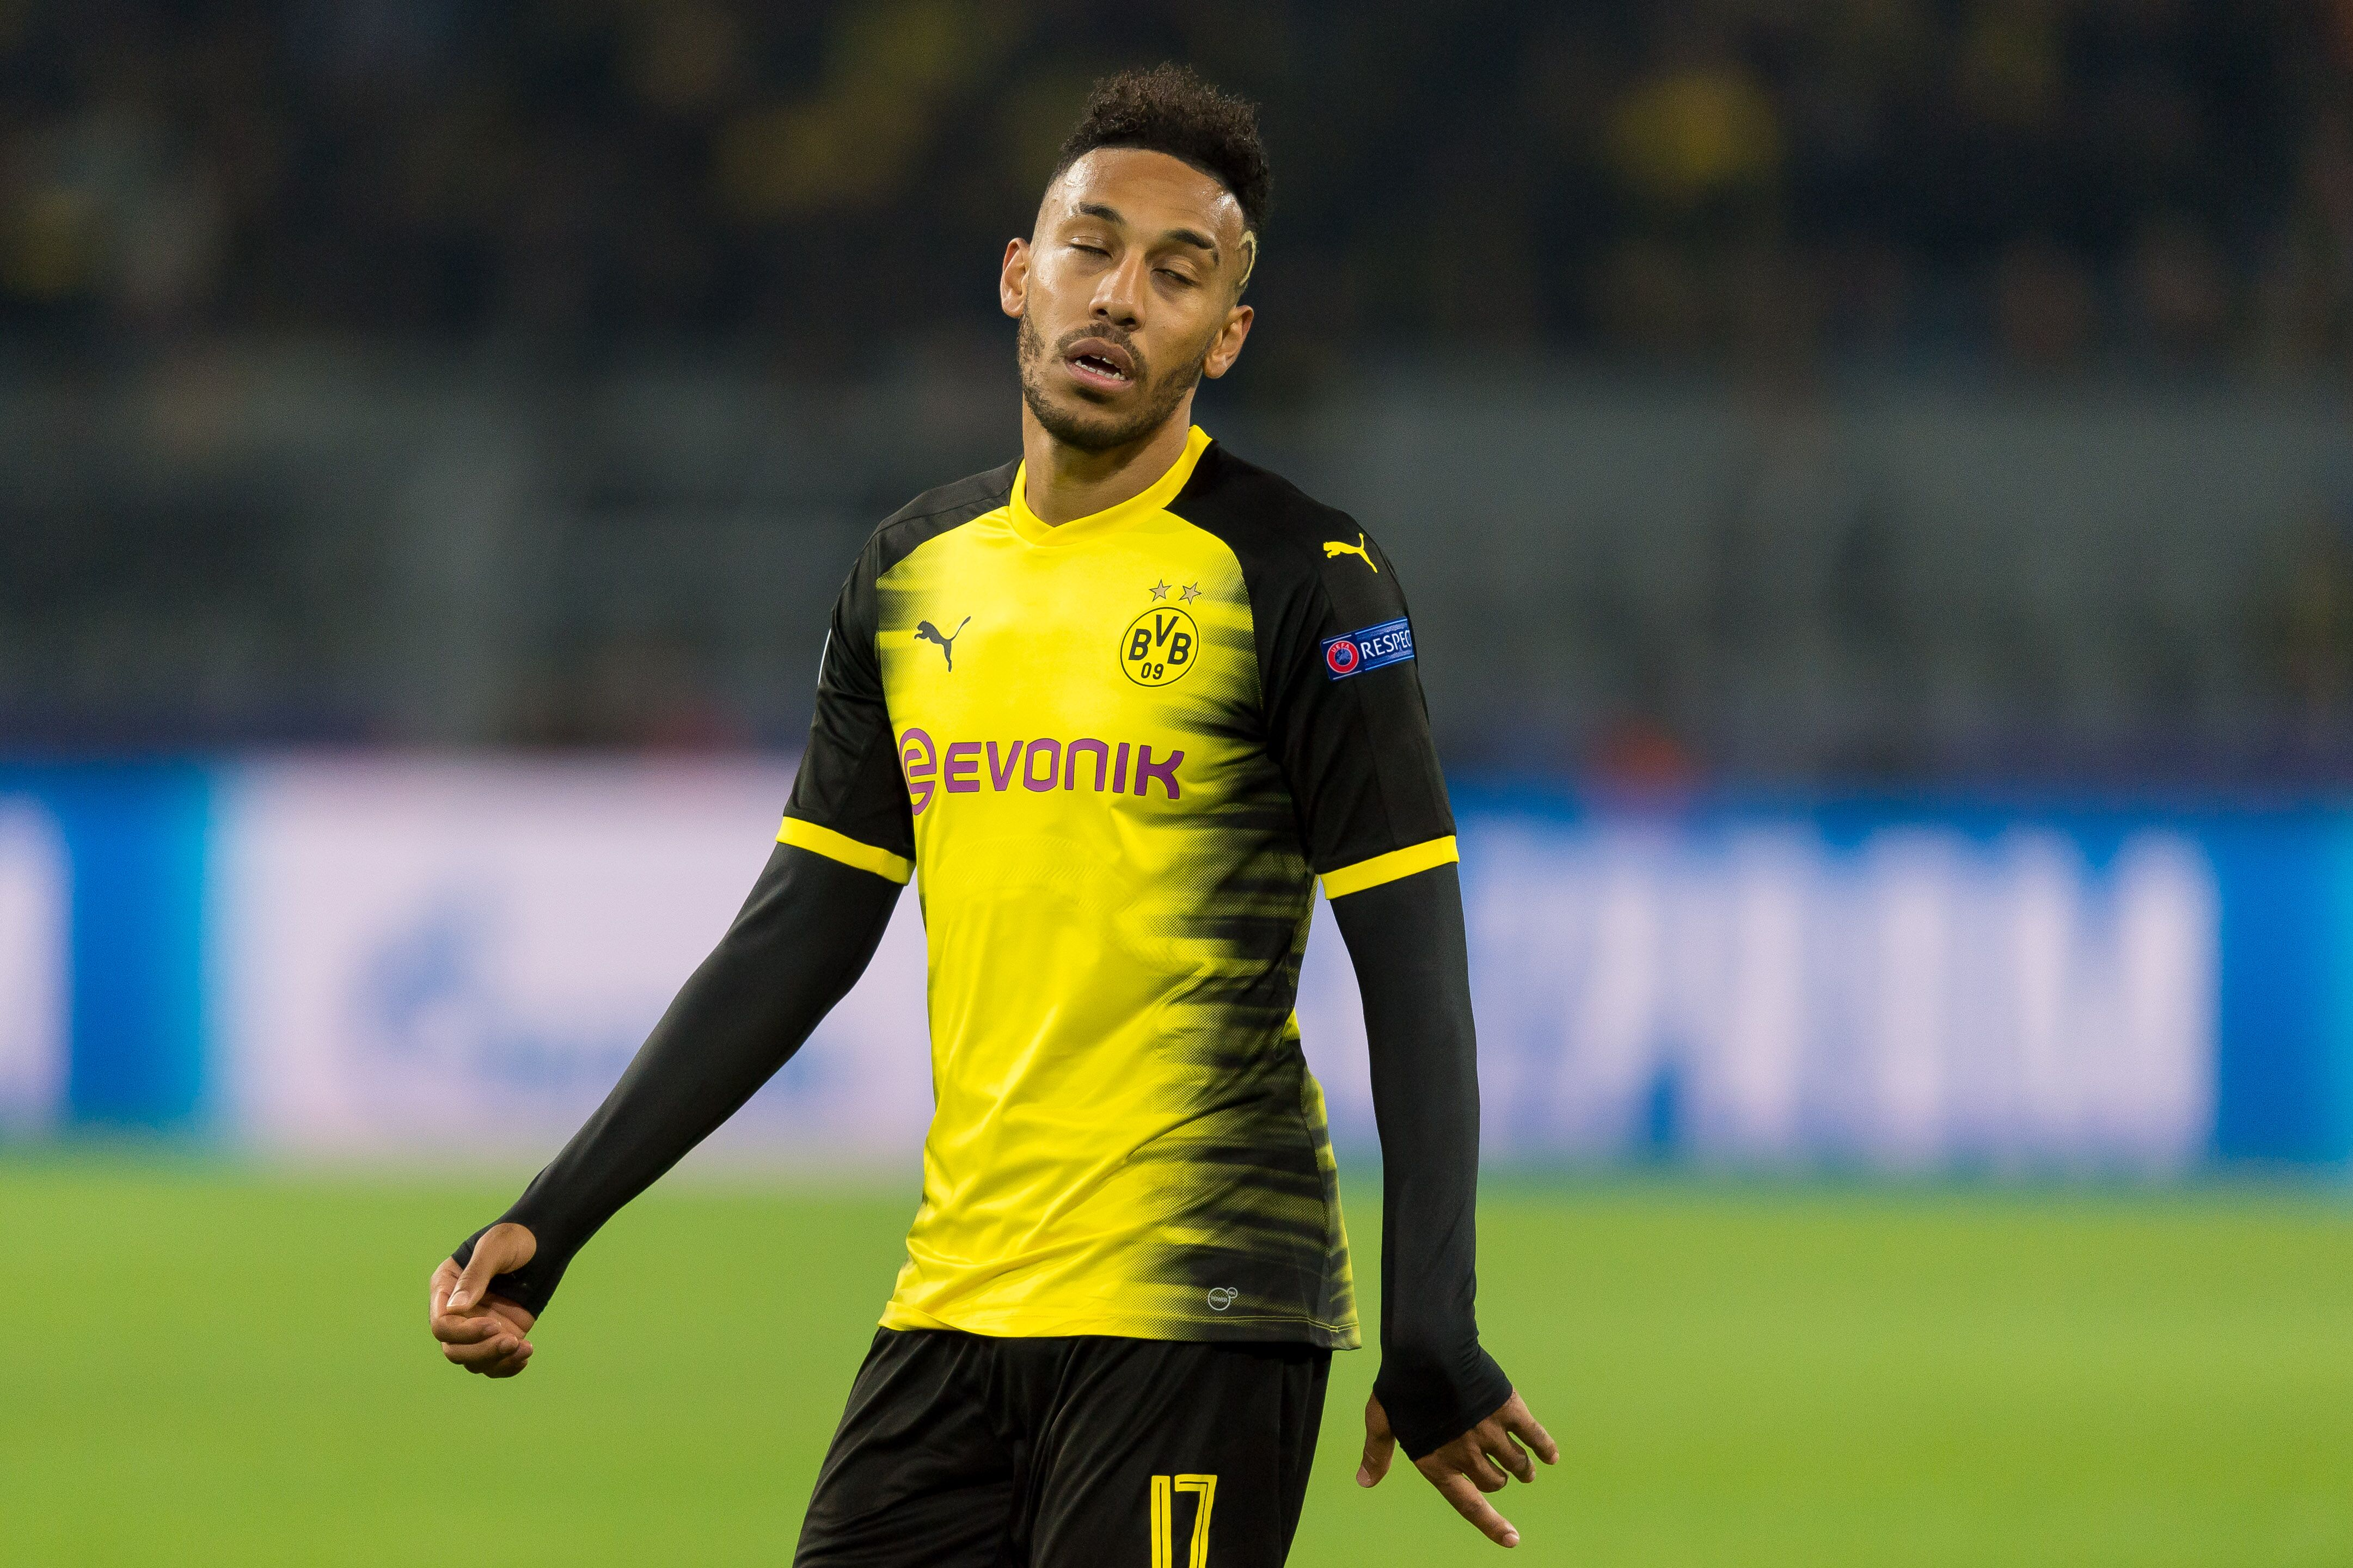 62b9a68d6 Borussia Dortmund angry with Arsenal as Aubameyang move hits a snag